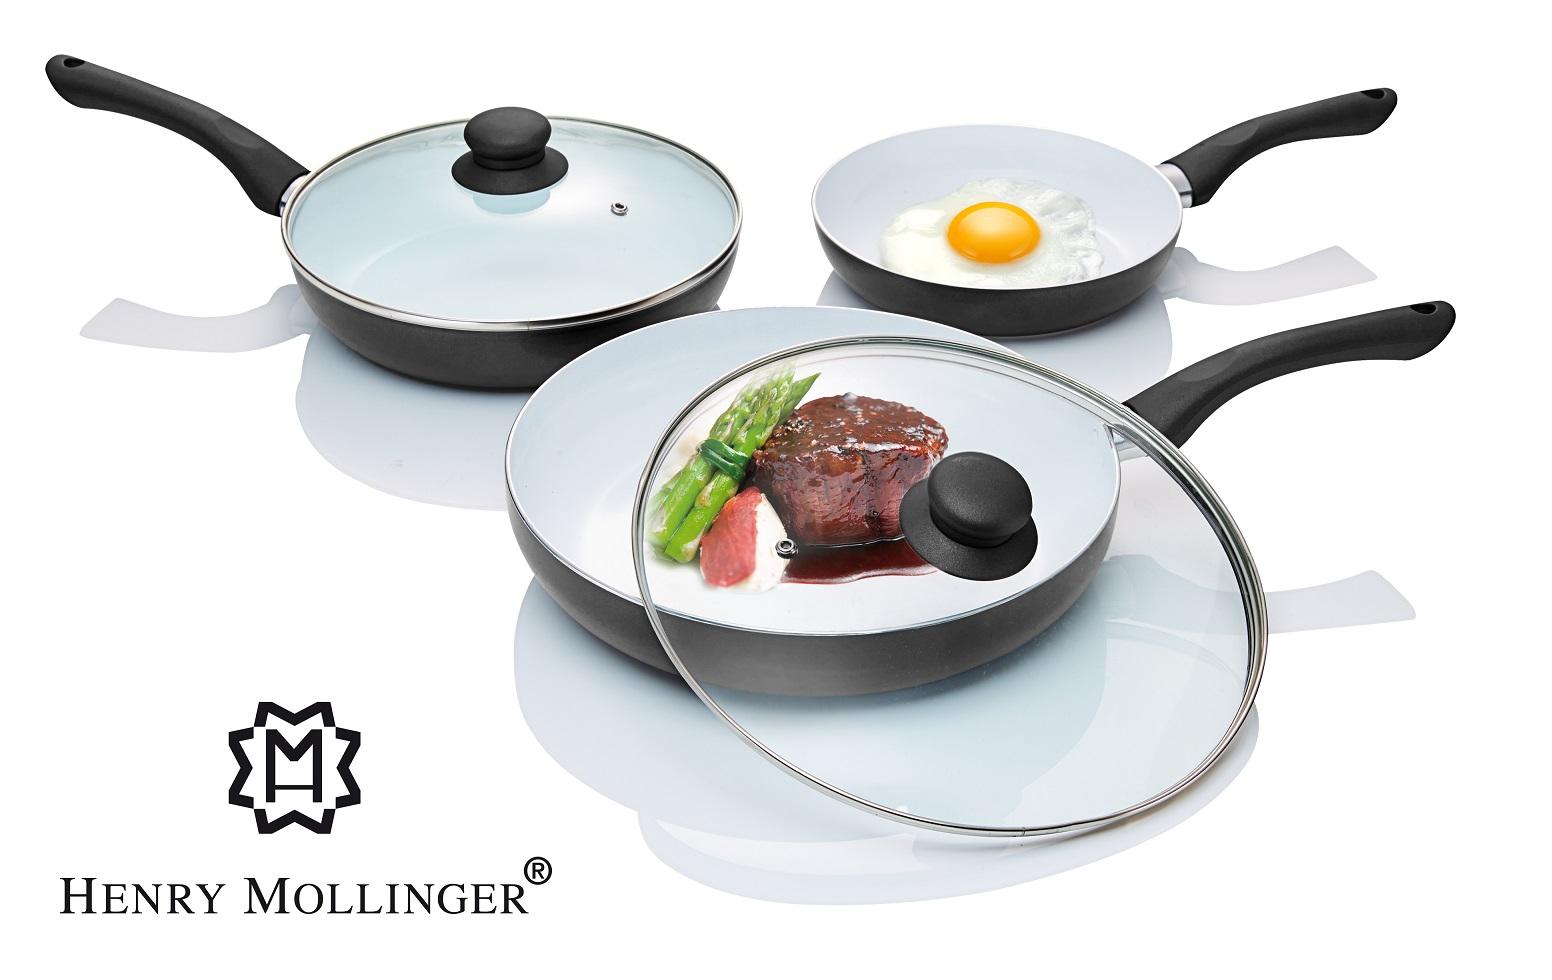 henry mollinger 5 teiliges induktion keramik pfannen set t pfe pfannen k che haushalt. Black Bedroom Furniture Sets. Home Design Ideas